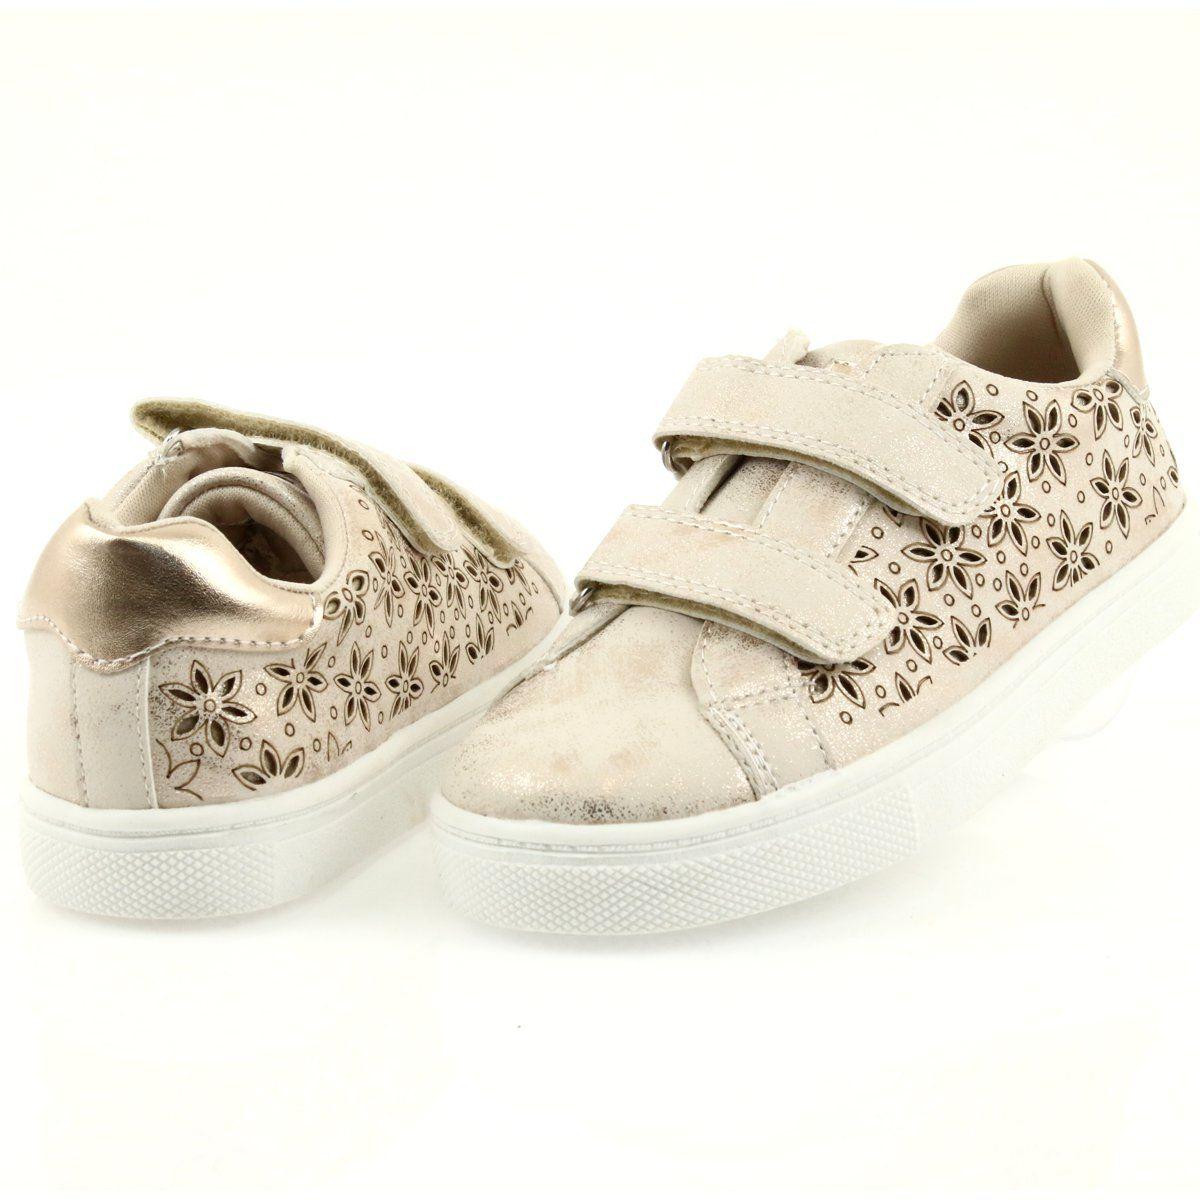 Buty Sportowe Buty Dzieciece Kwiaty American Club Zloty Sports Shoes For Girls Sports Shoes Childrens Shoes